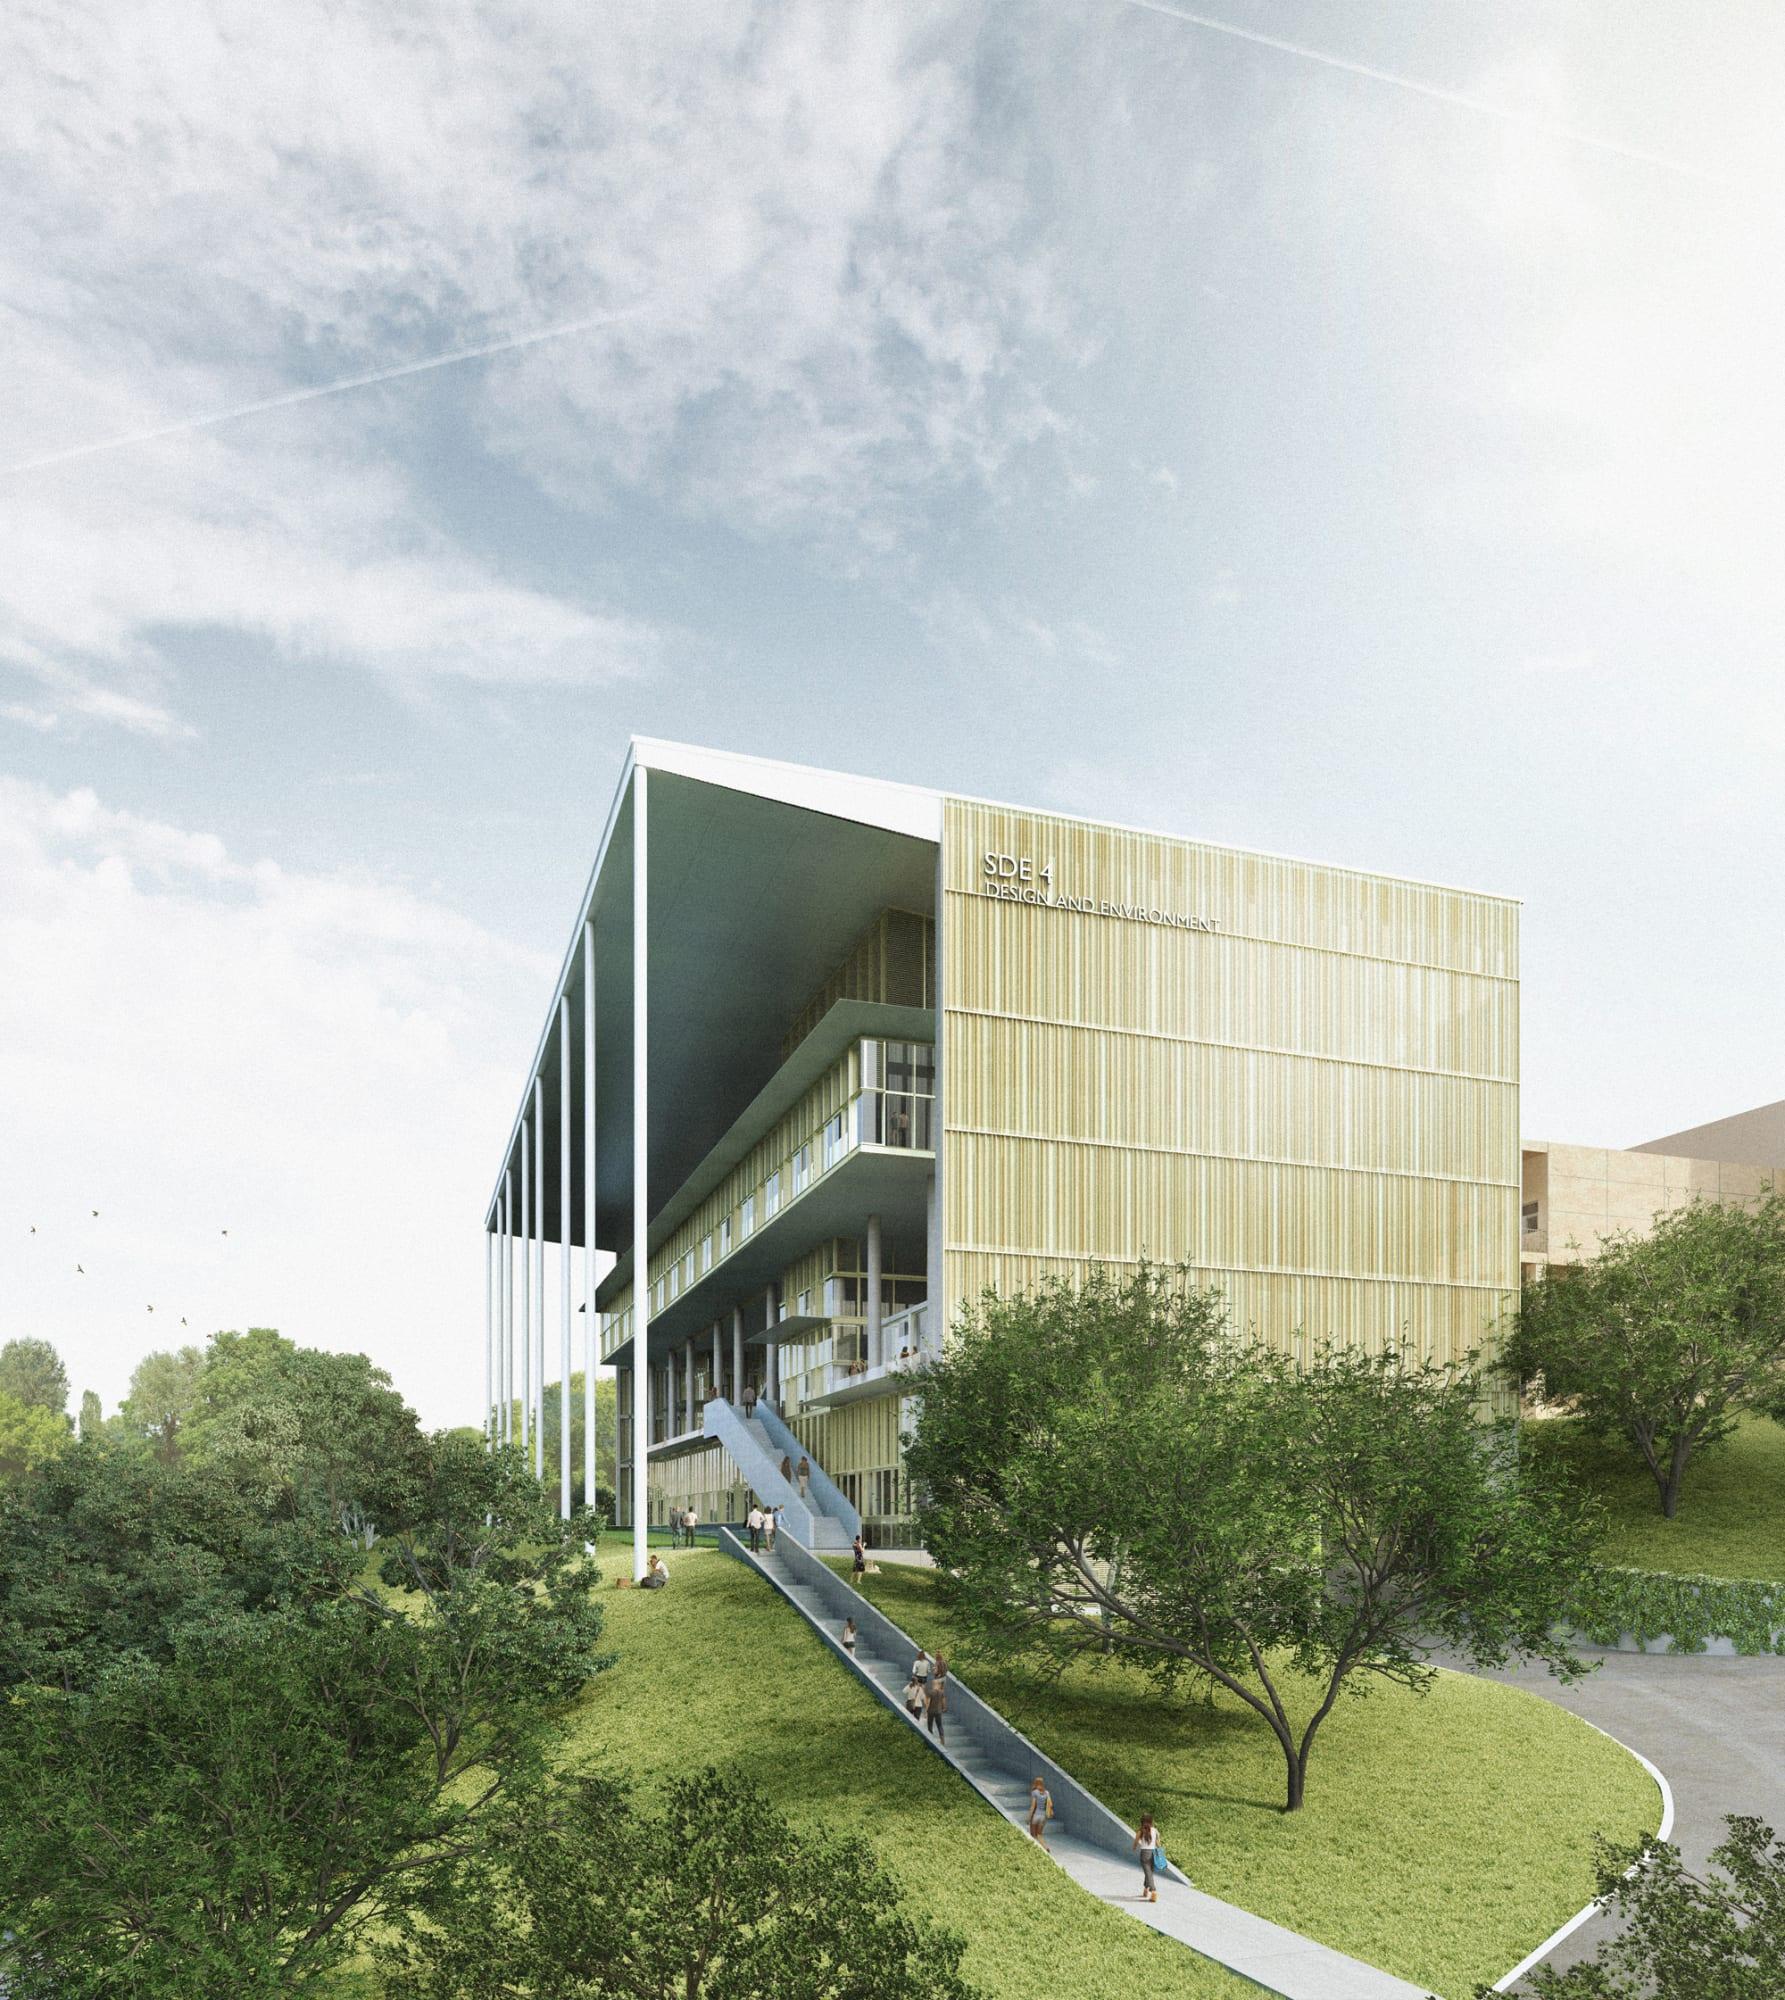 Serie Architects New School Of Design Environment National University Of Singapore Divisare,Two Car Garage Interior Design Ideas